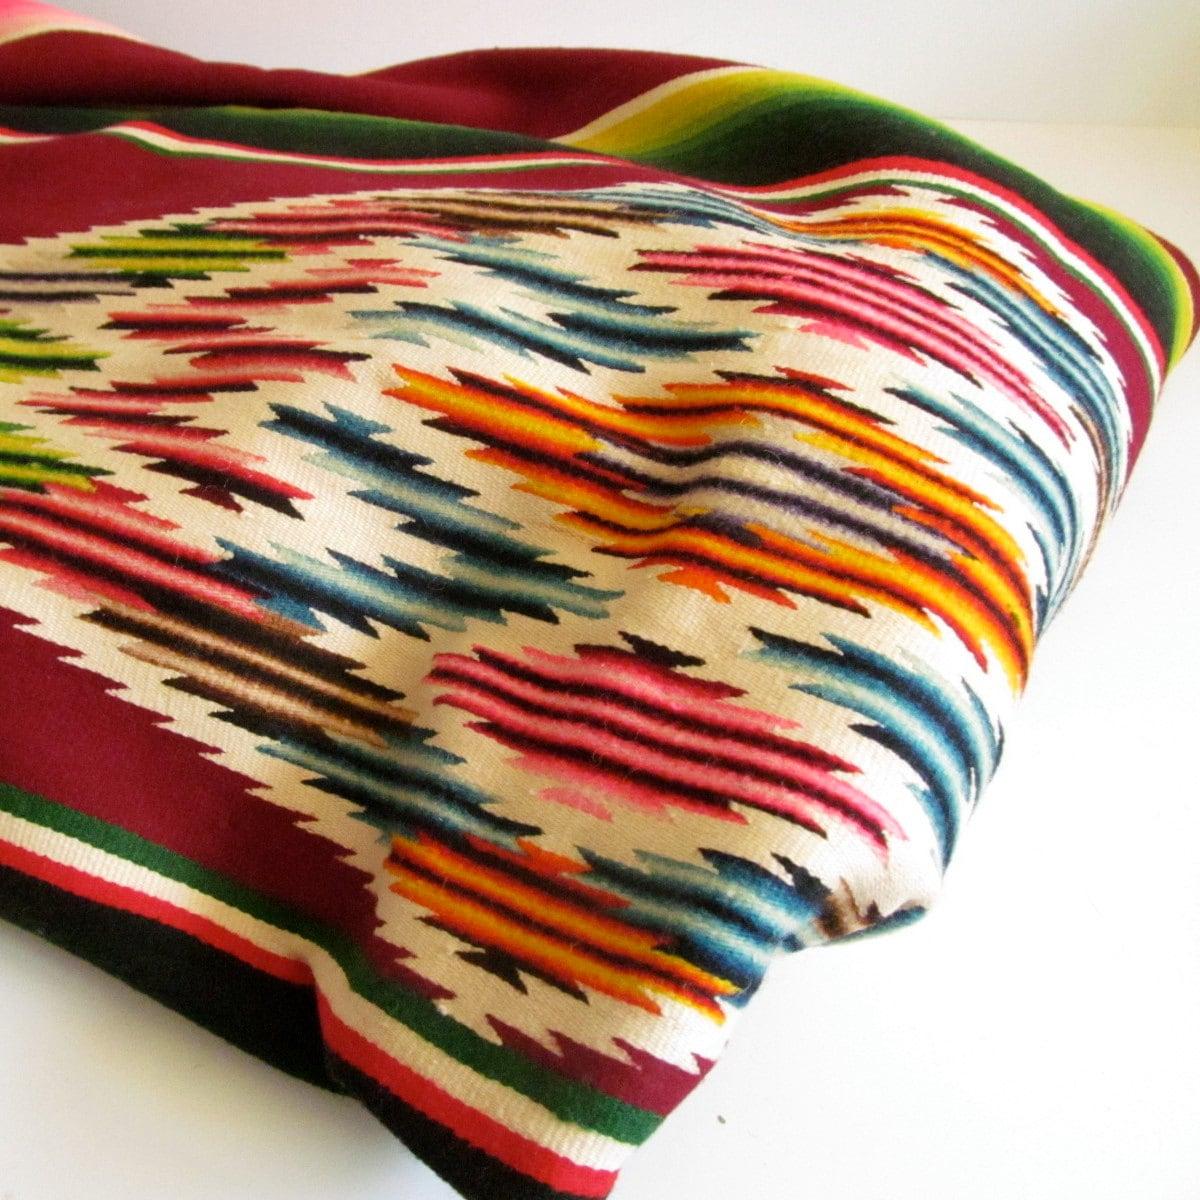 Sister vintage mexican blanket stuff